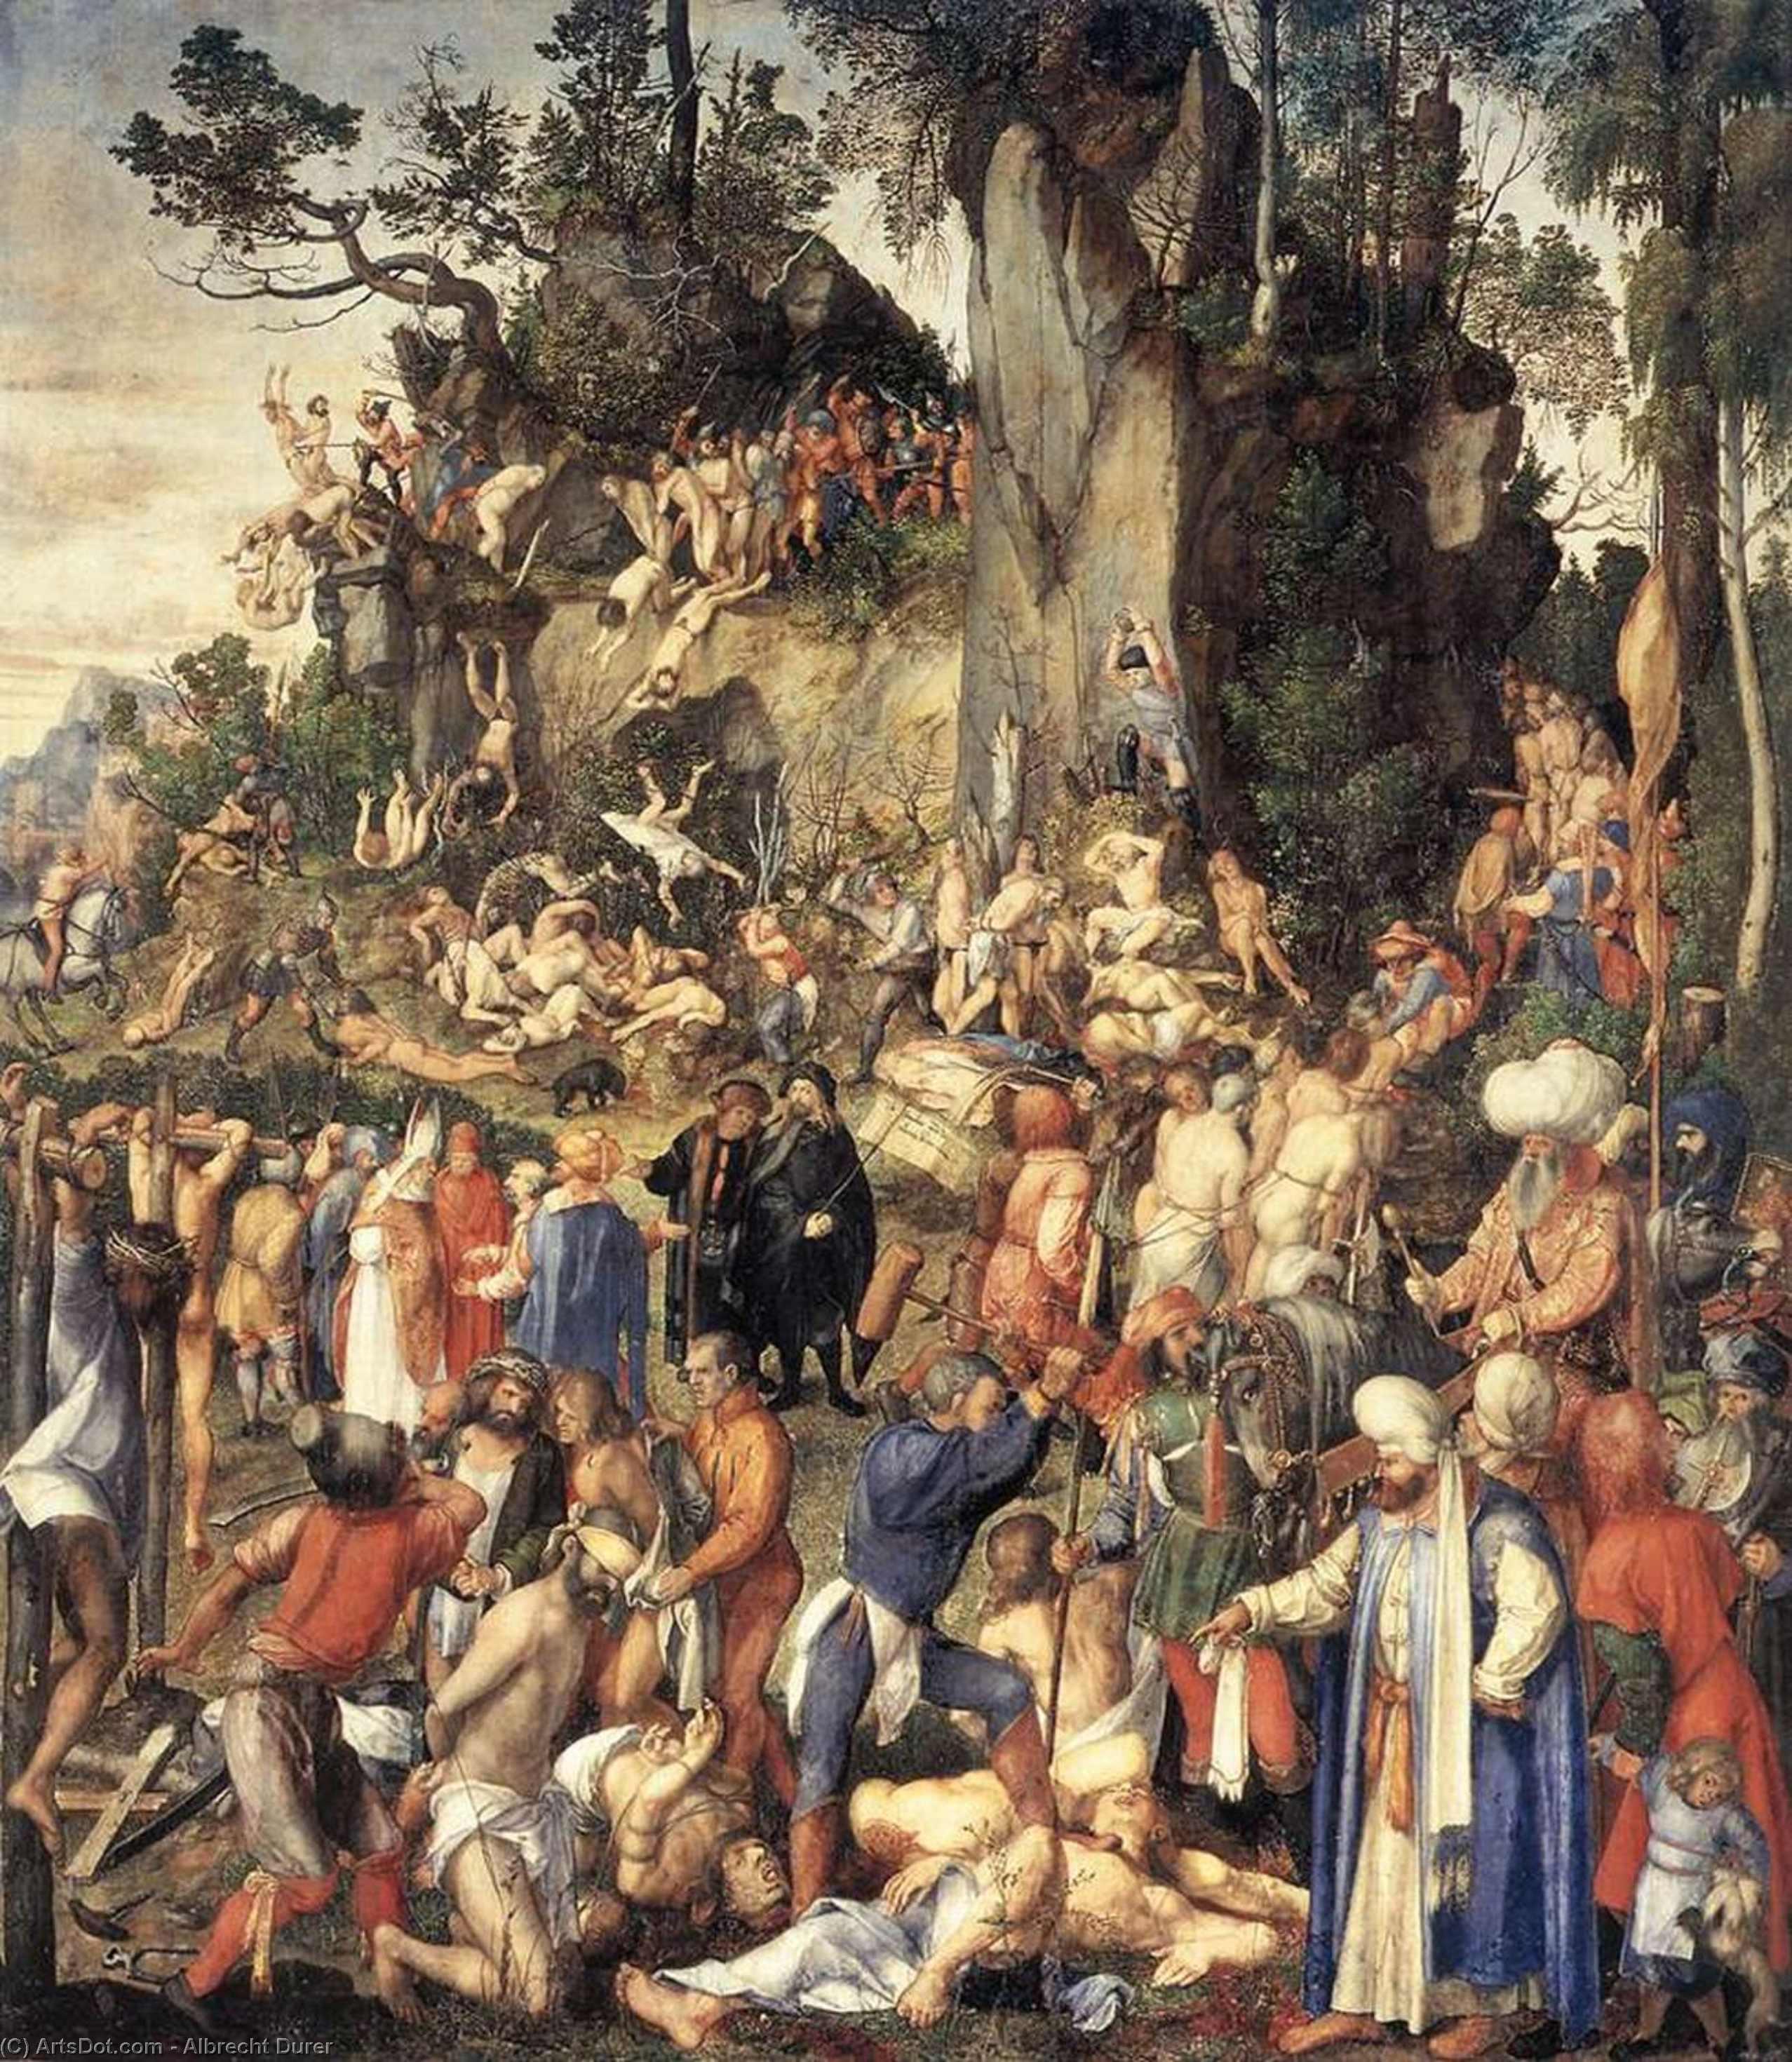 WikiOO.org - Güzel Sanatlar Ansiklopedisi - Resim, Resimler Albrecht Durer - The Martyrdom of the Ten Thousand